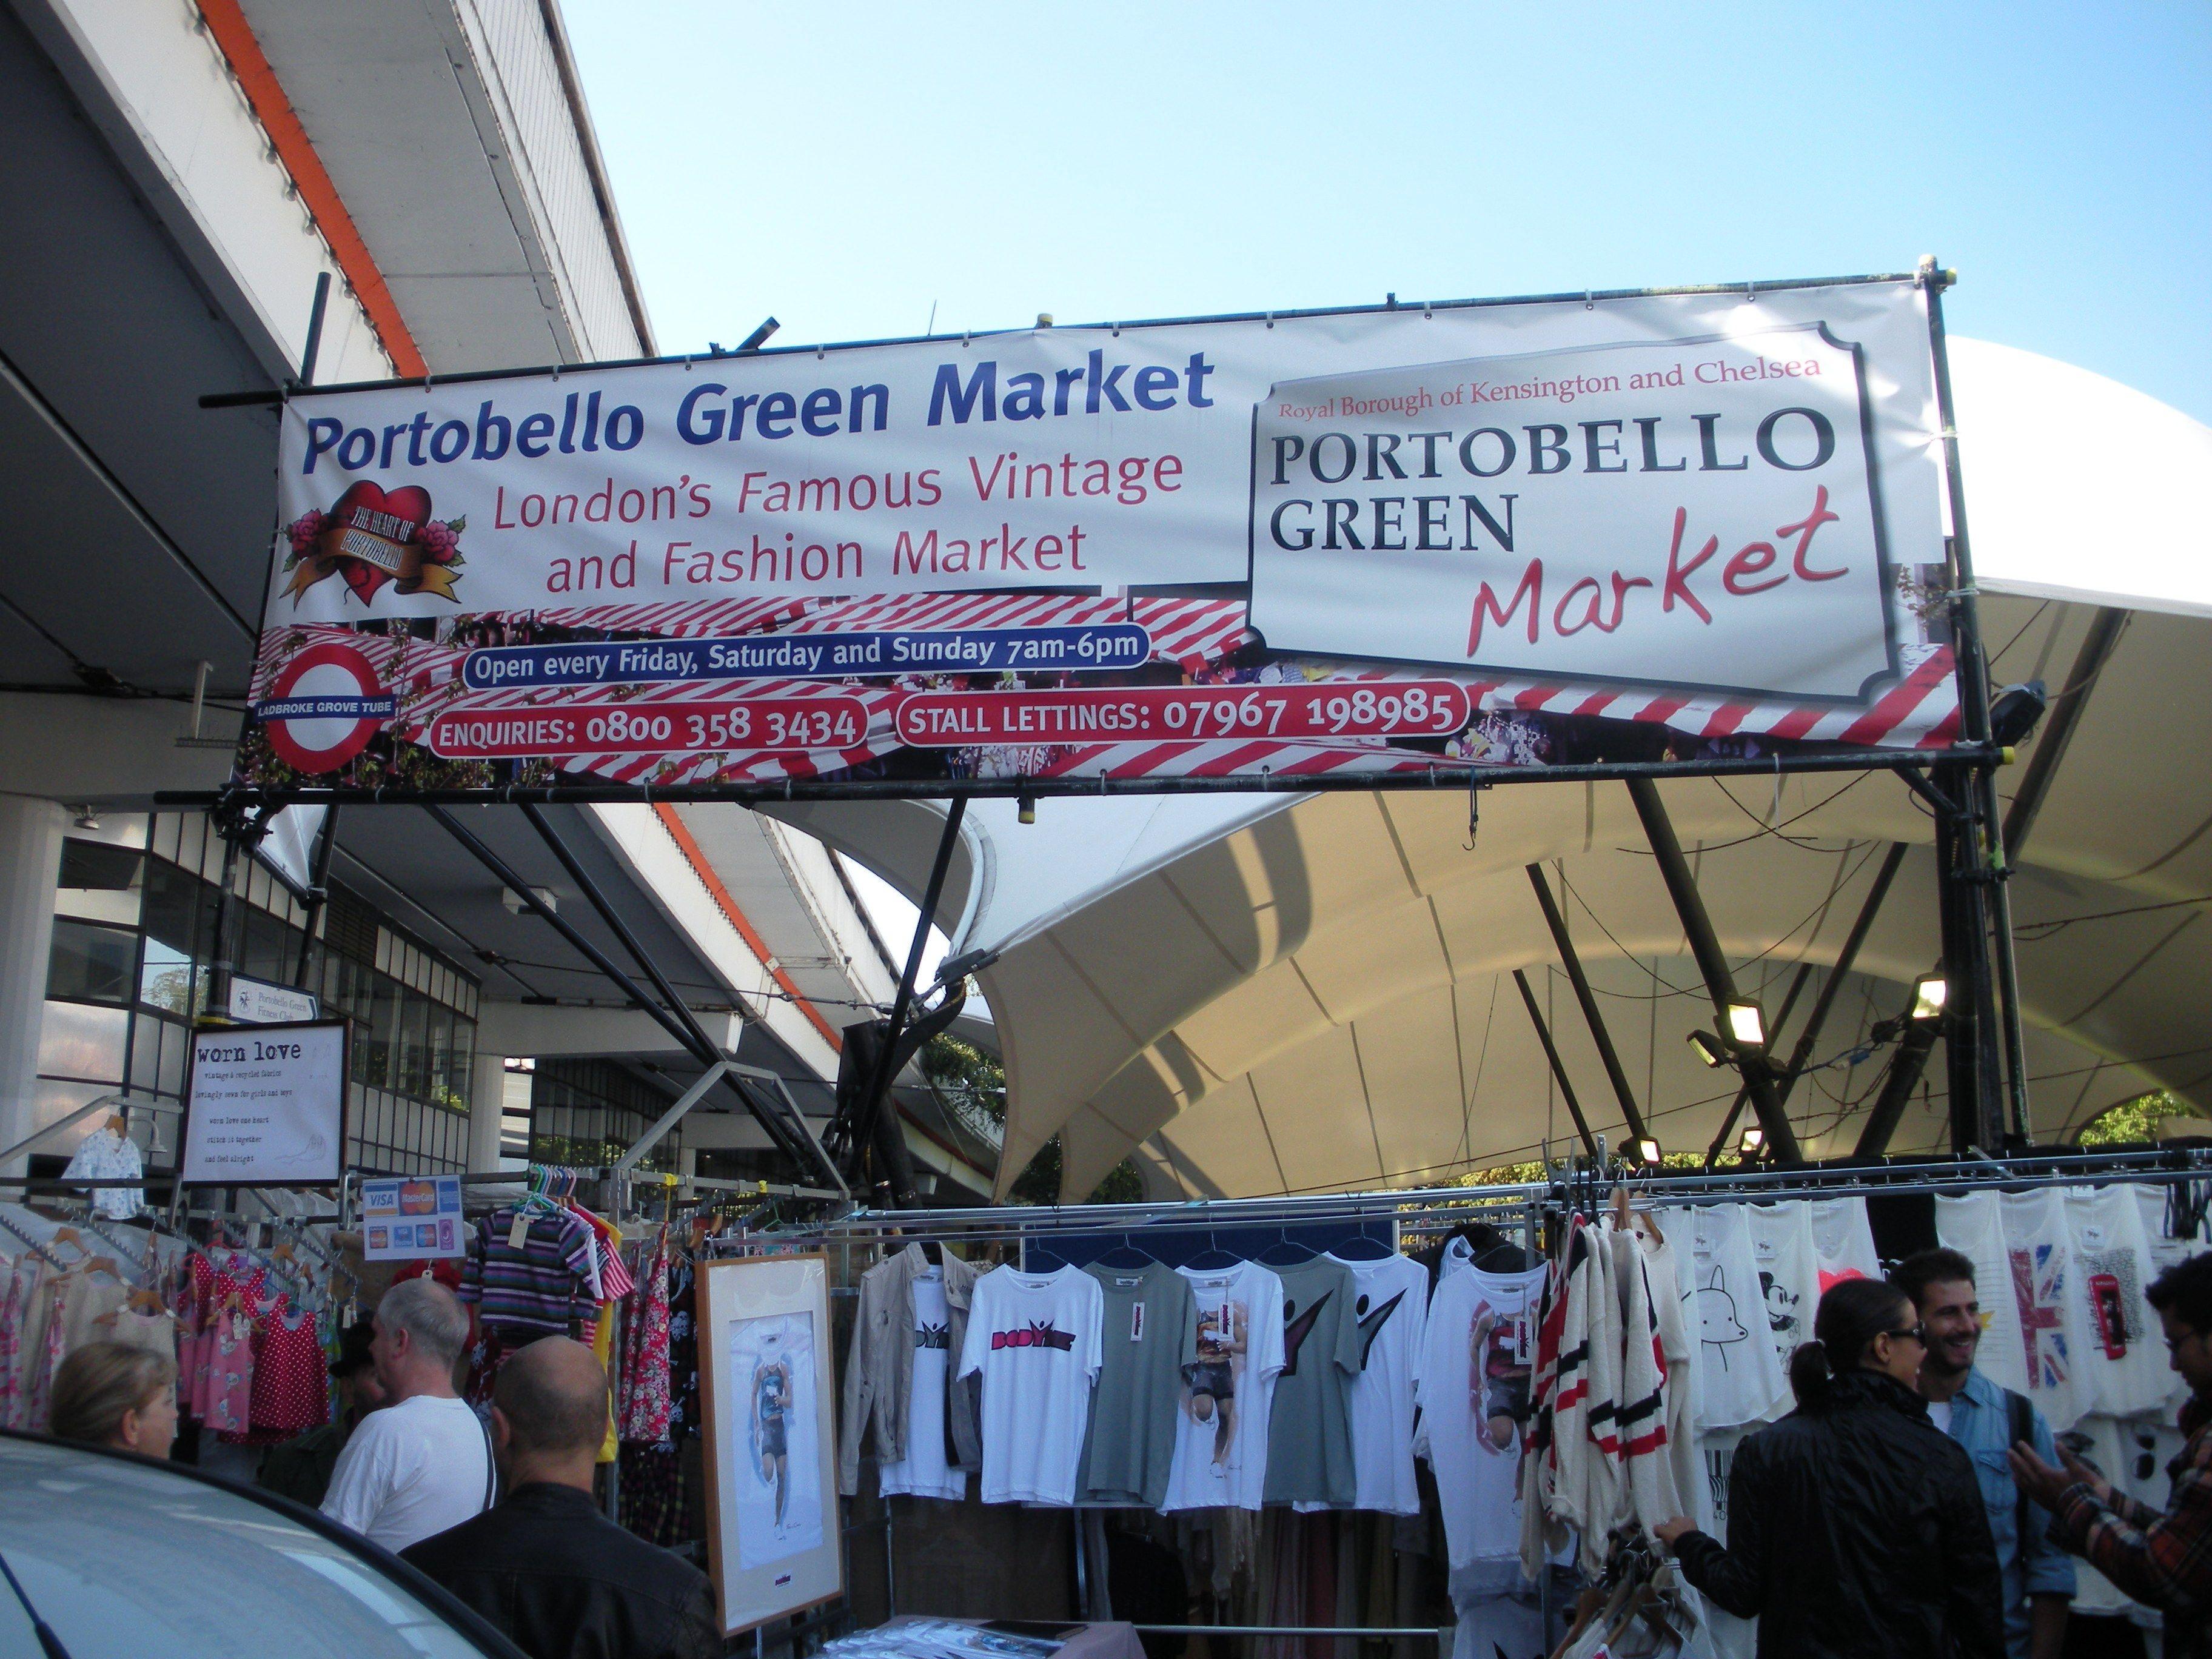 281 portobello market under westway - Google Search | Places of ...